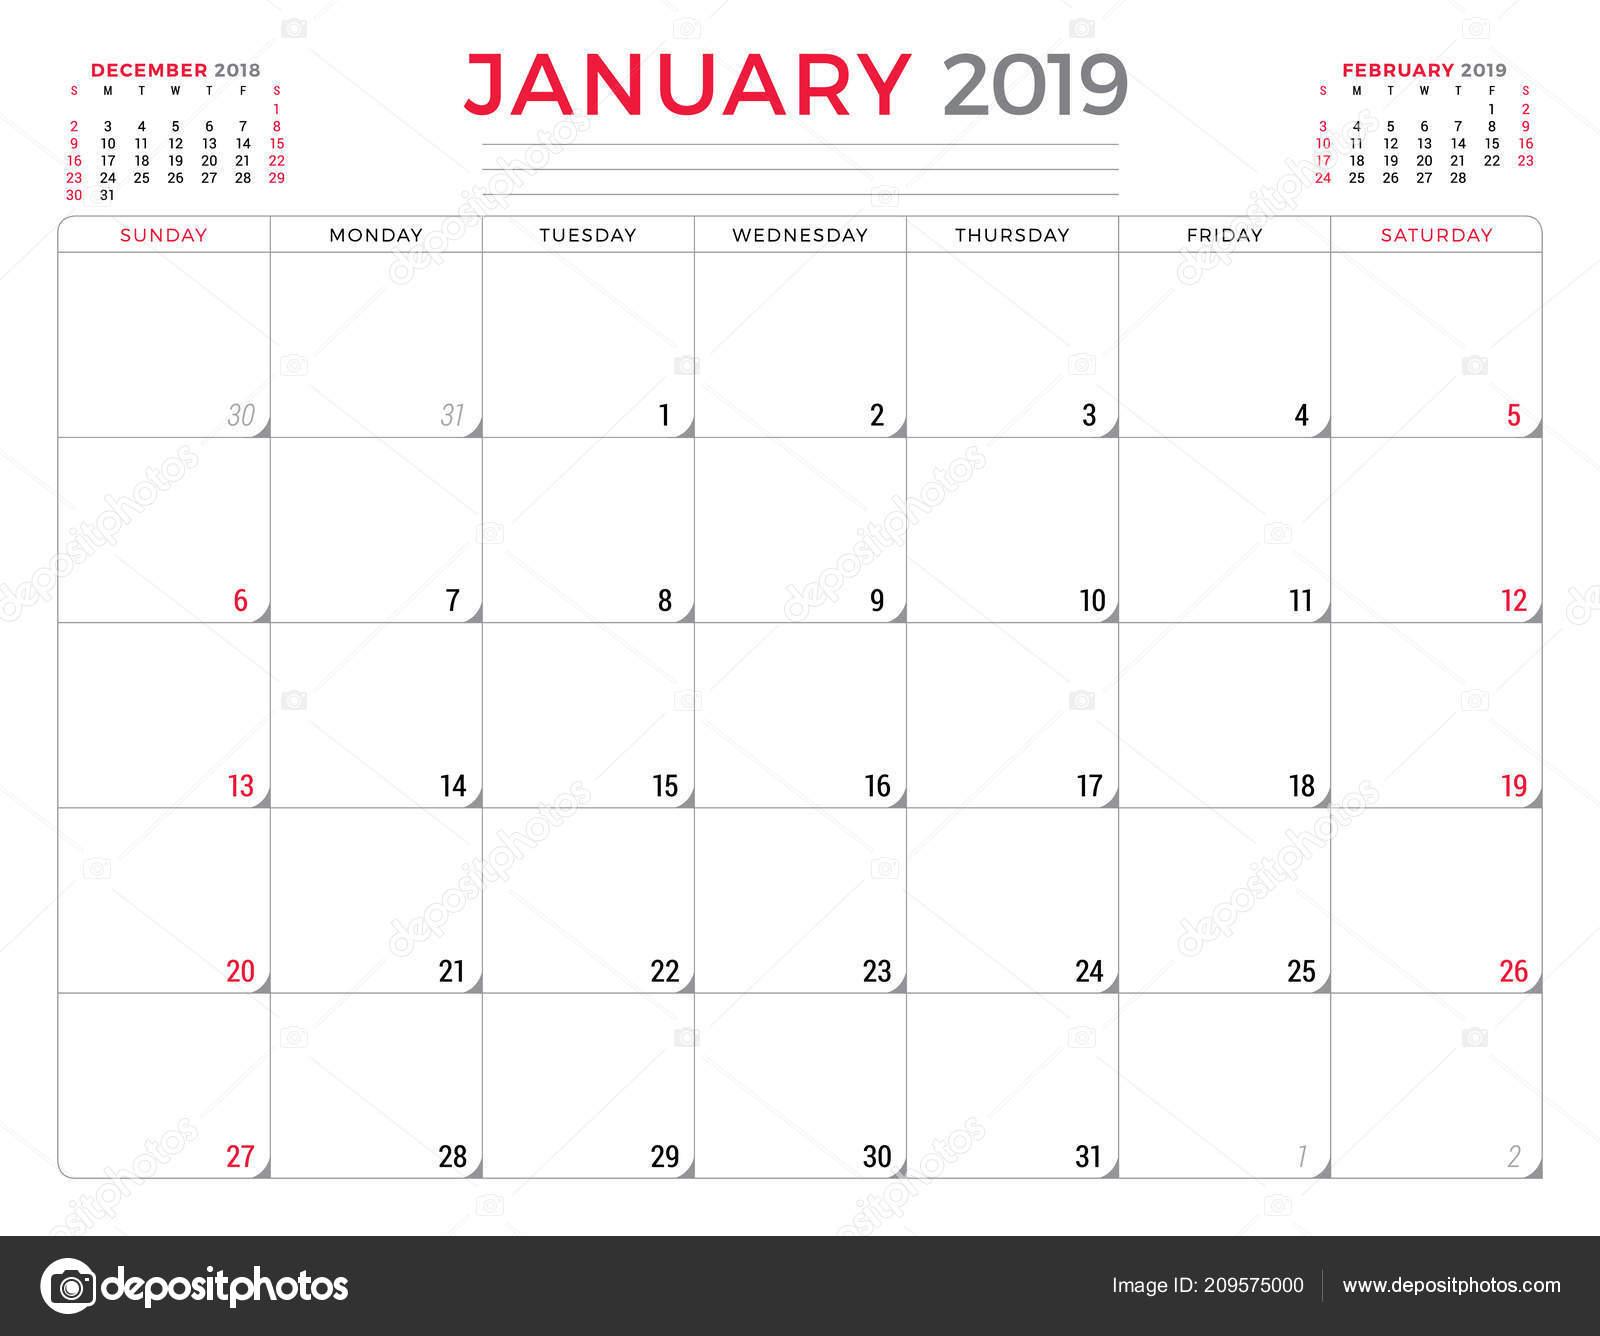 January 2019 Calendar Planner Stationery Design Template Vector